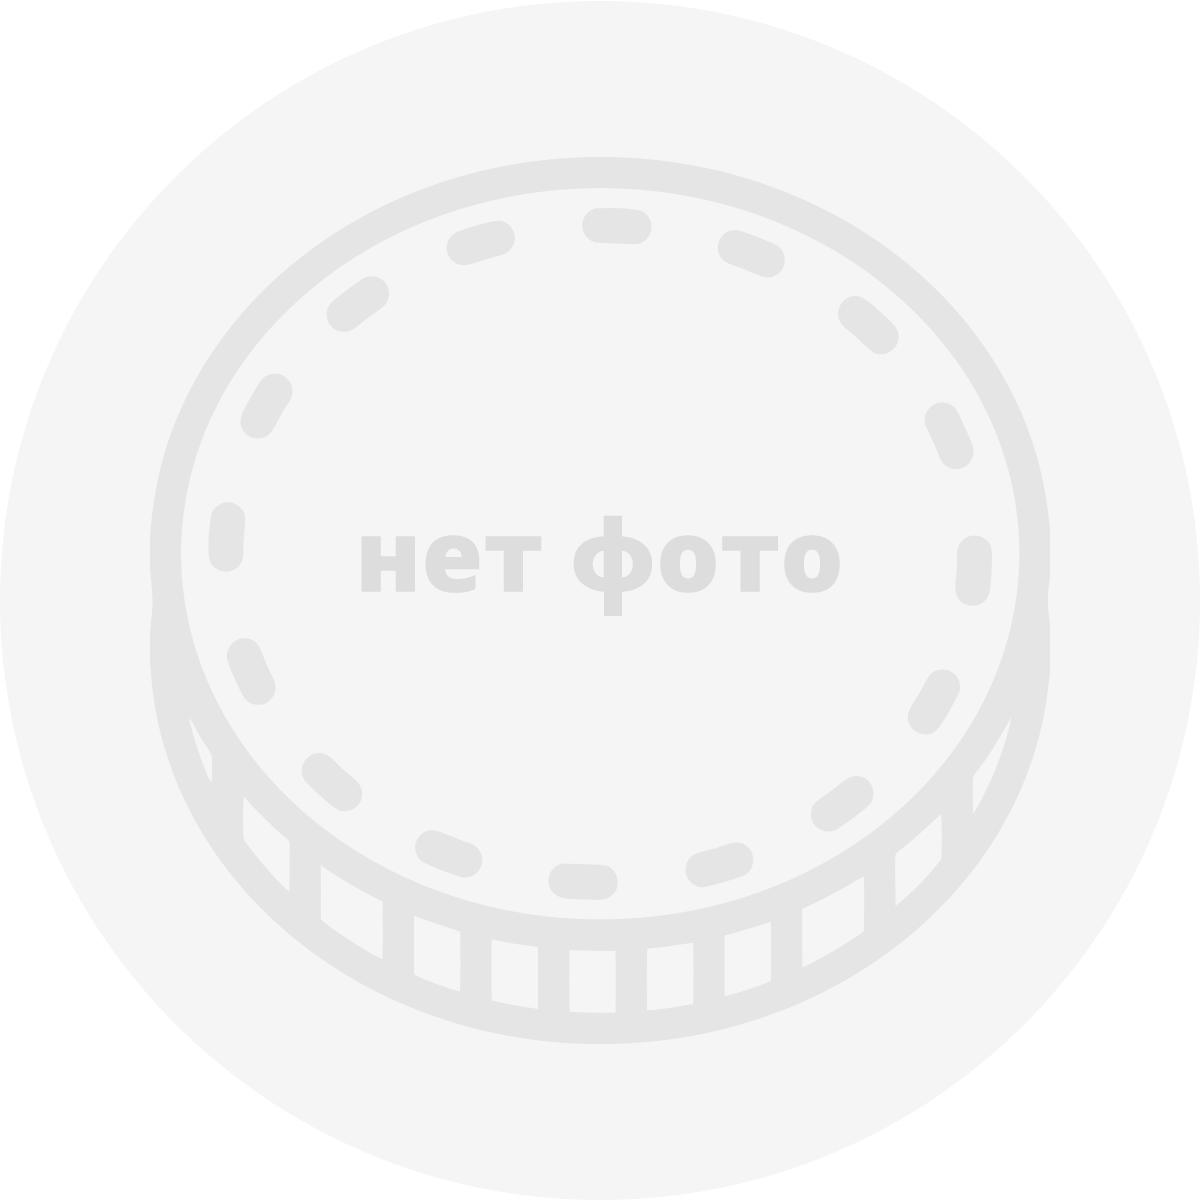 Теркс и Кайкос, 20 крон (1999 г.)